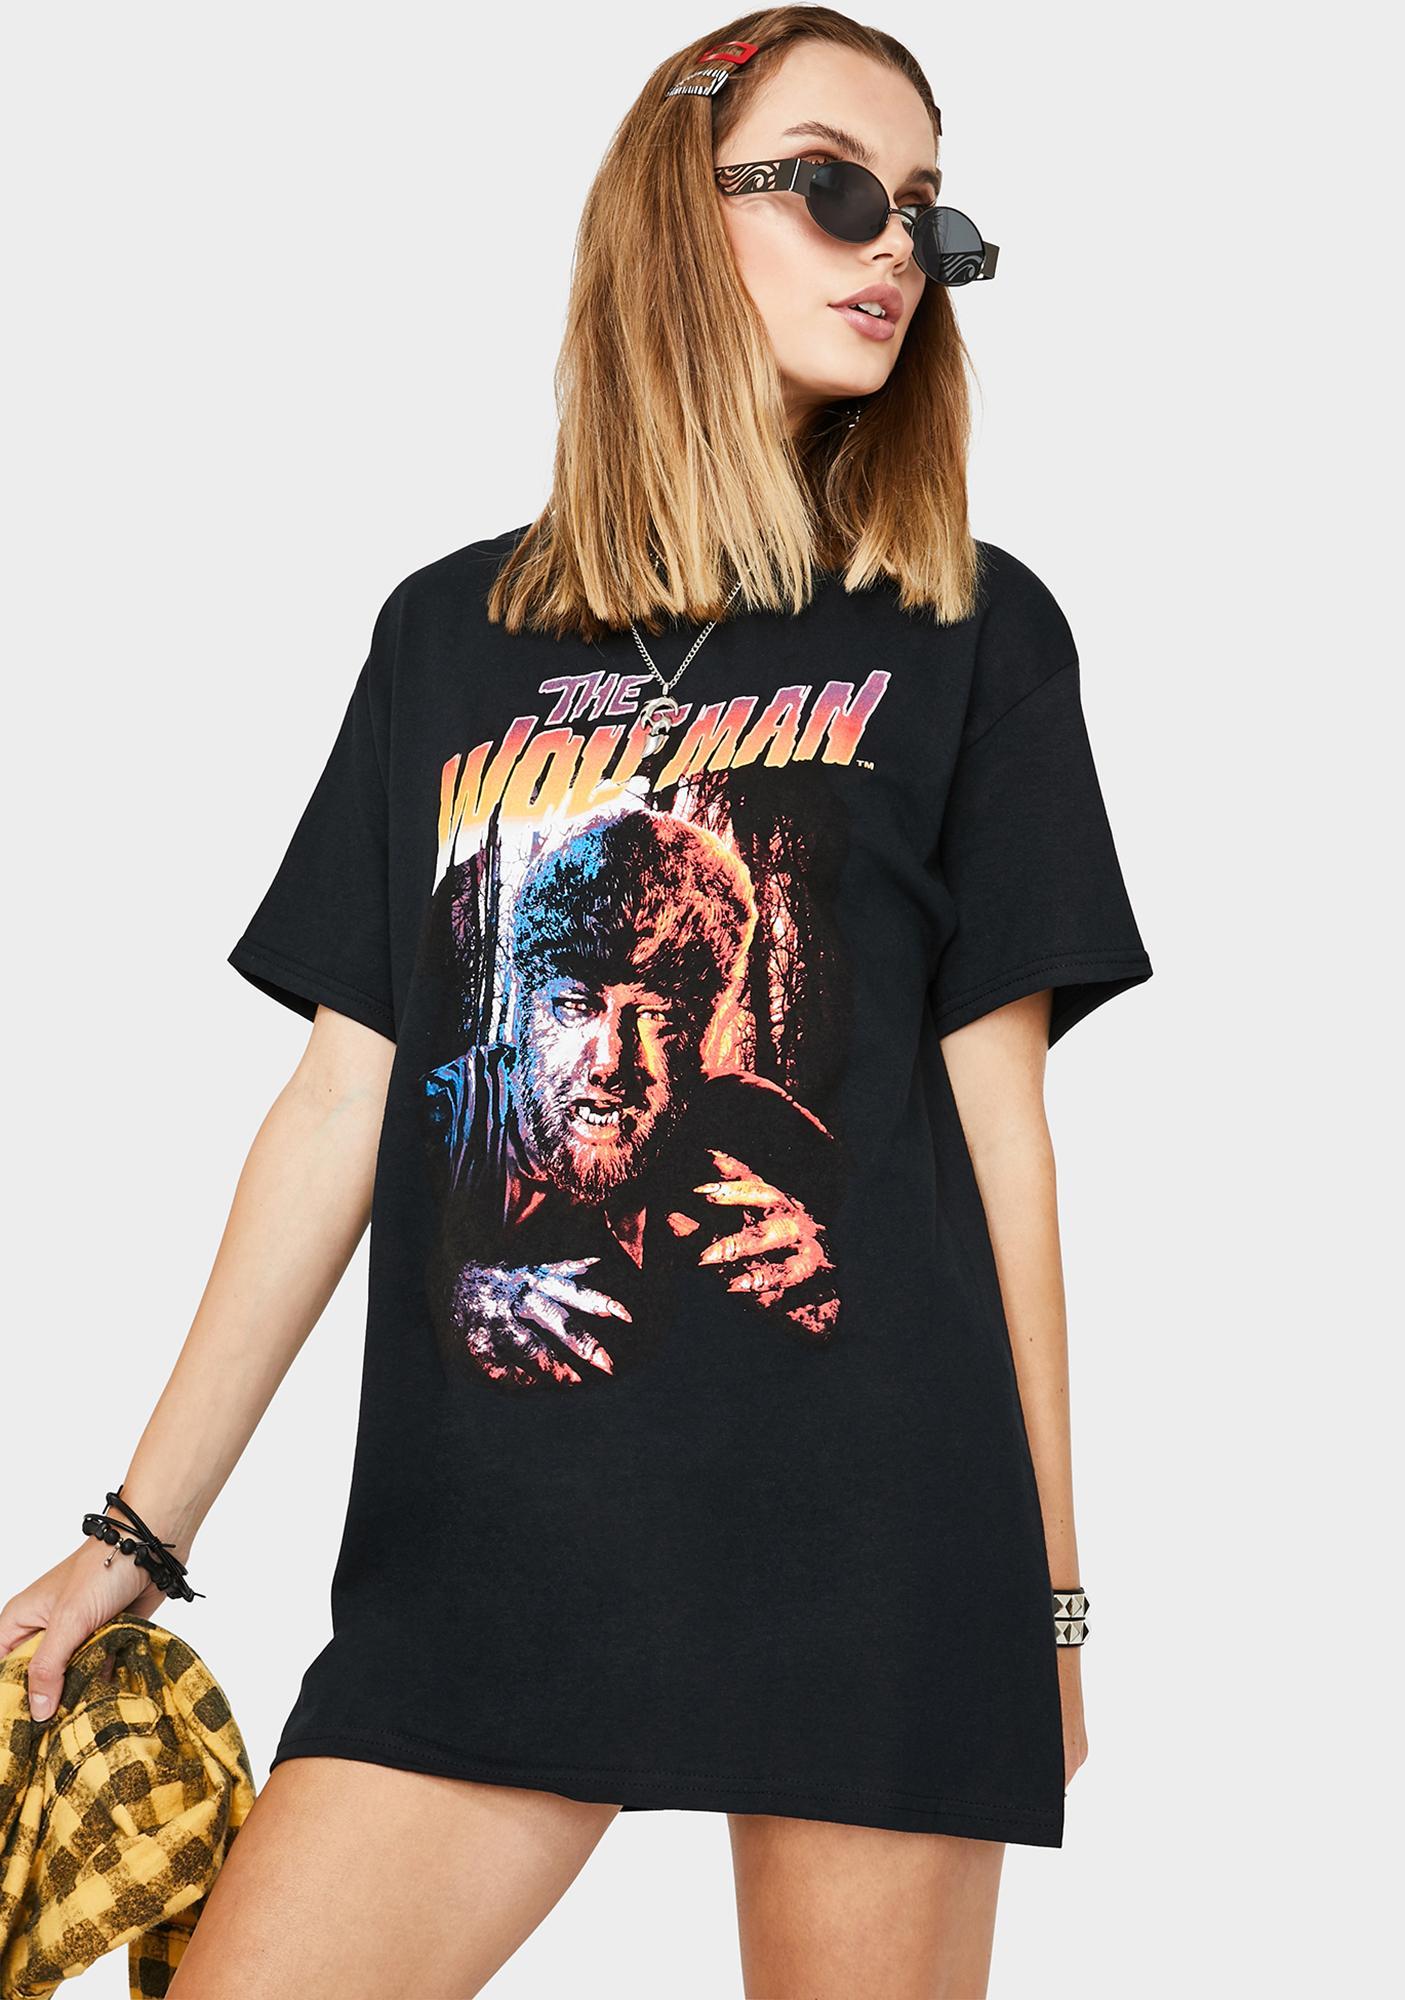 Rock Rebel Wolfman Graphic Tee